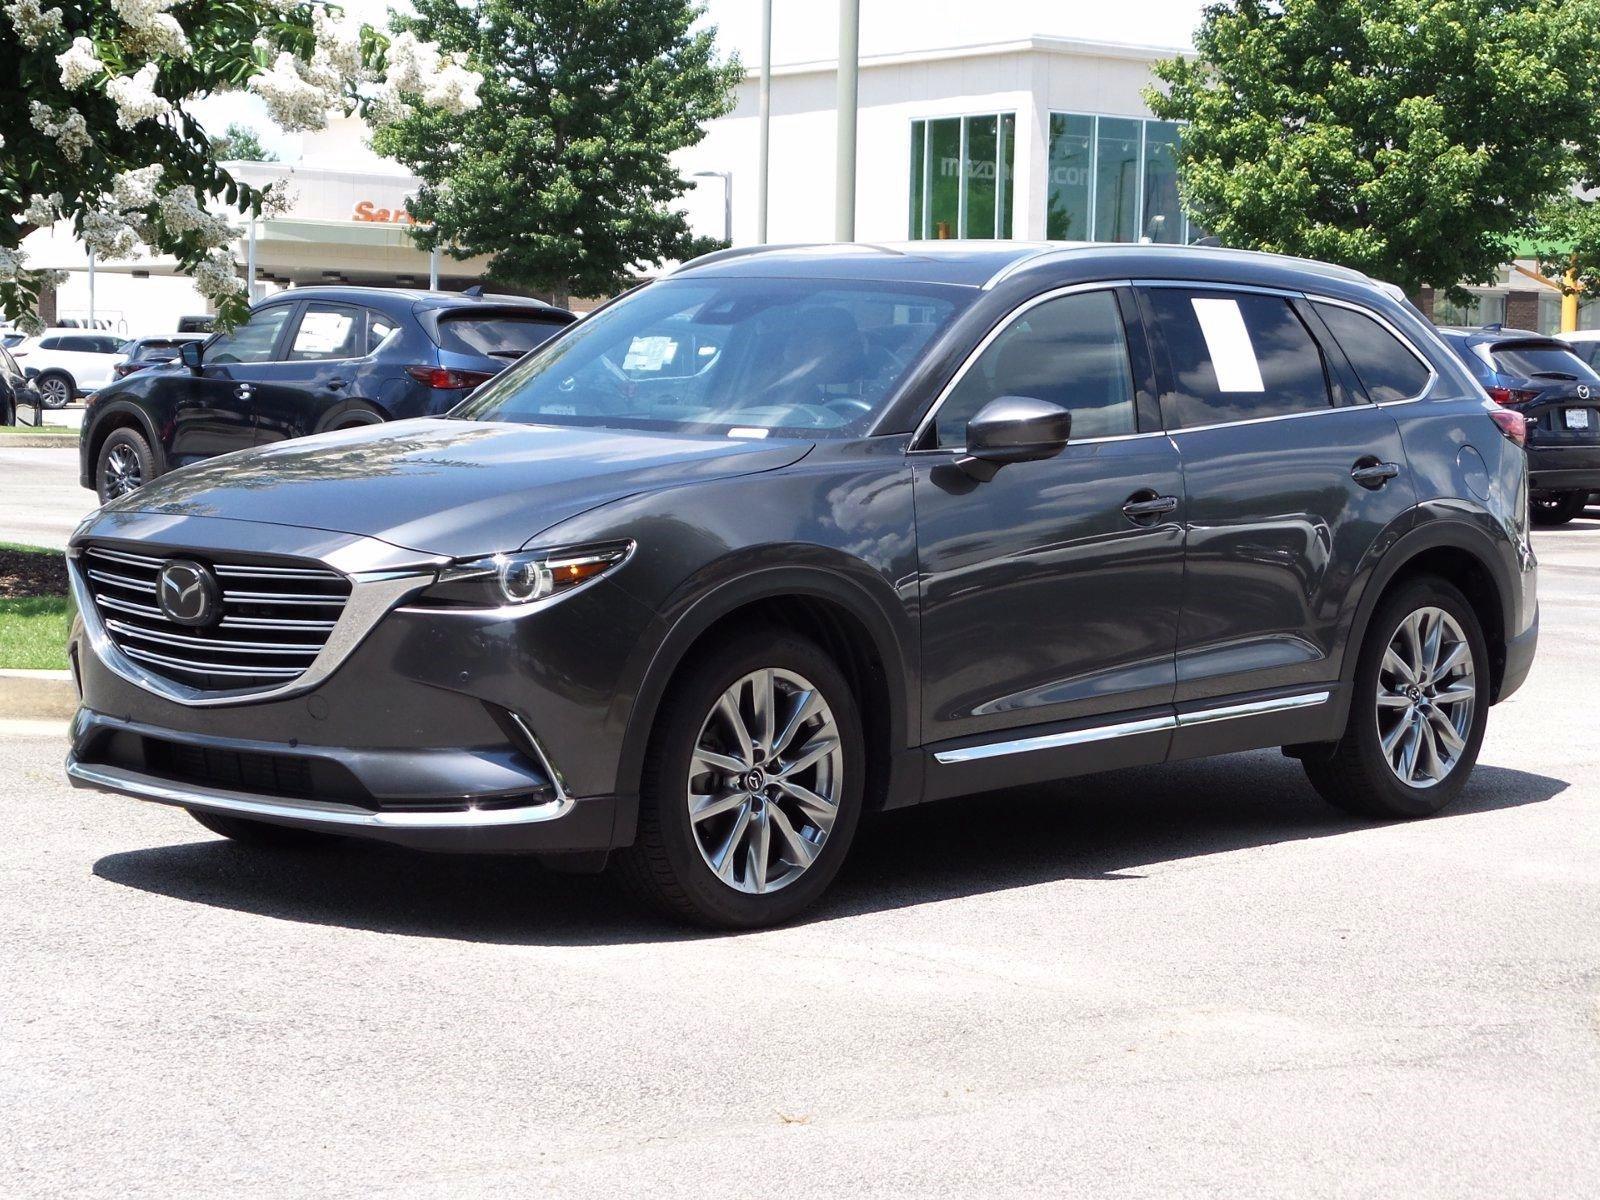 Certified Pre-Owned 2019 Mazda CX-9 Signature